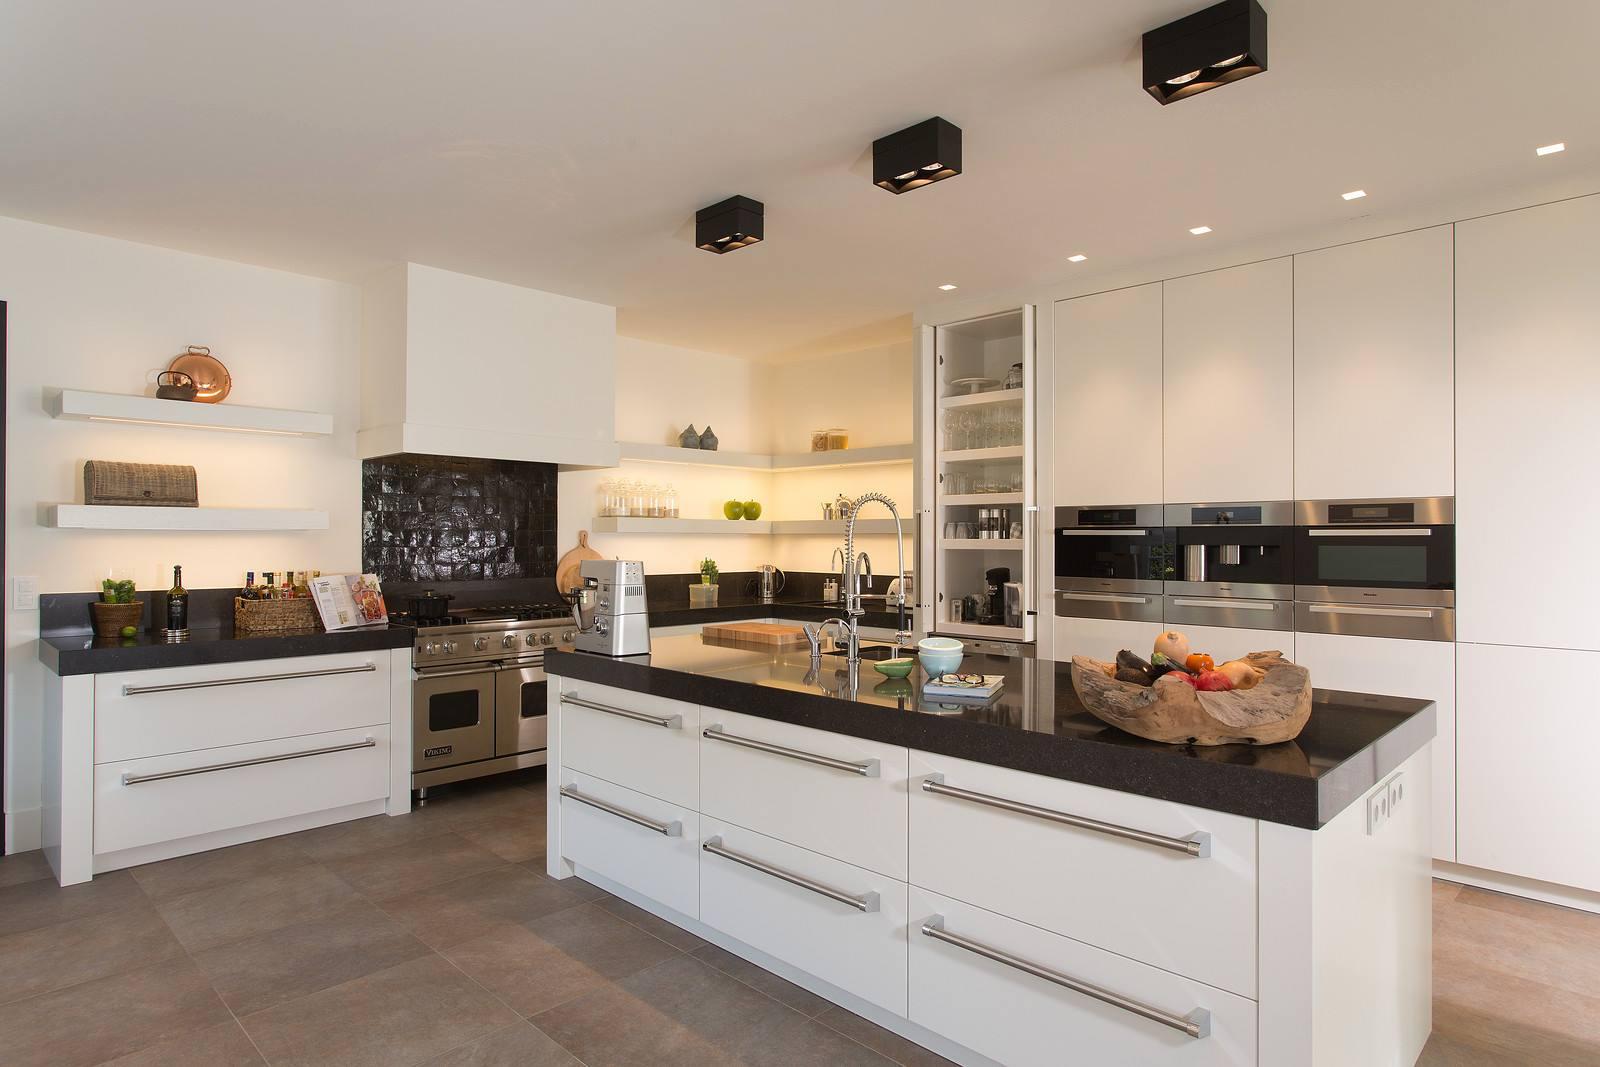 Hoogglans Witte Keuken Met Betonblad : Keuken met keukeneiland – Exclusief Milano via Tieleman Keukens